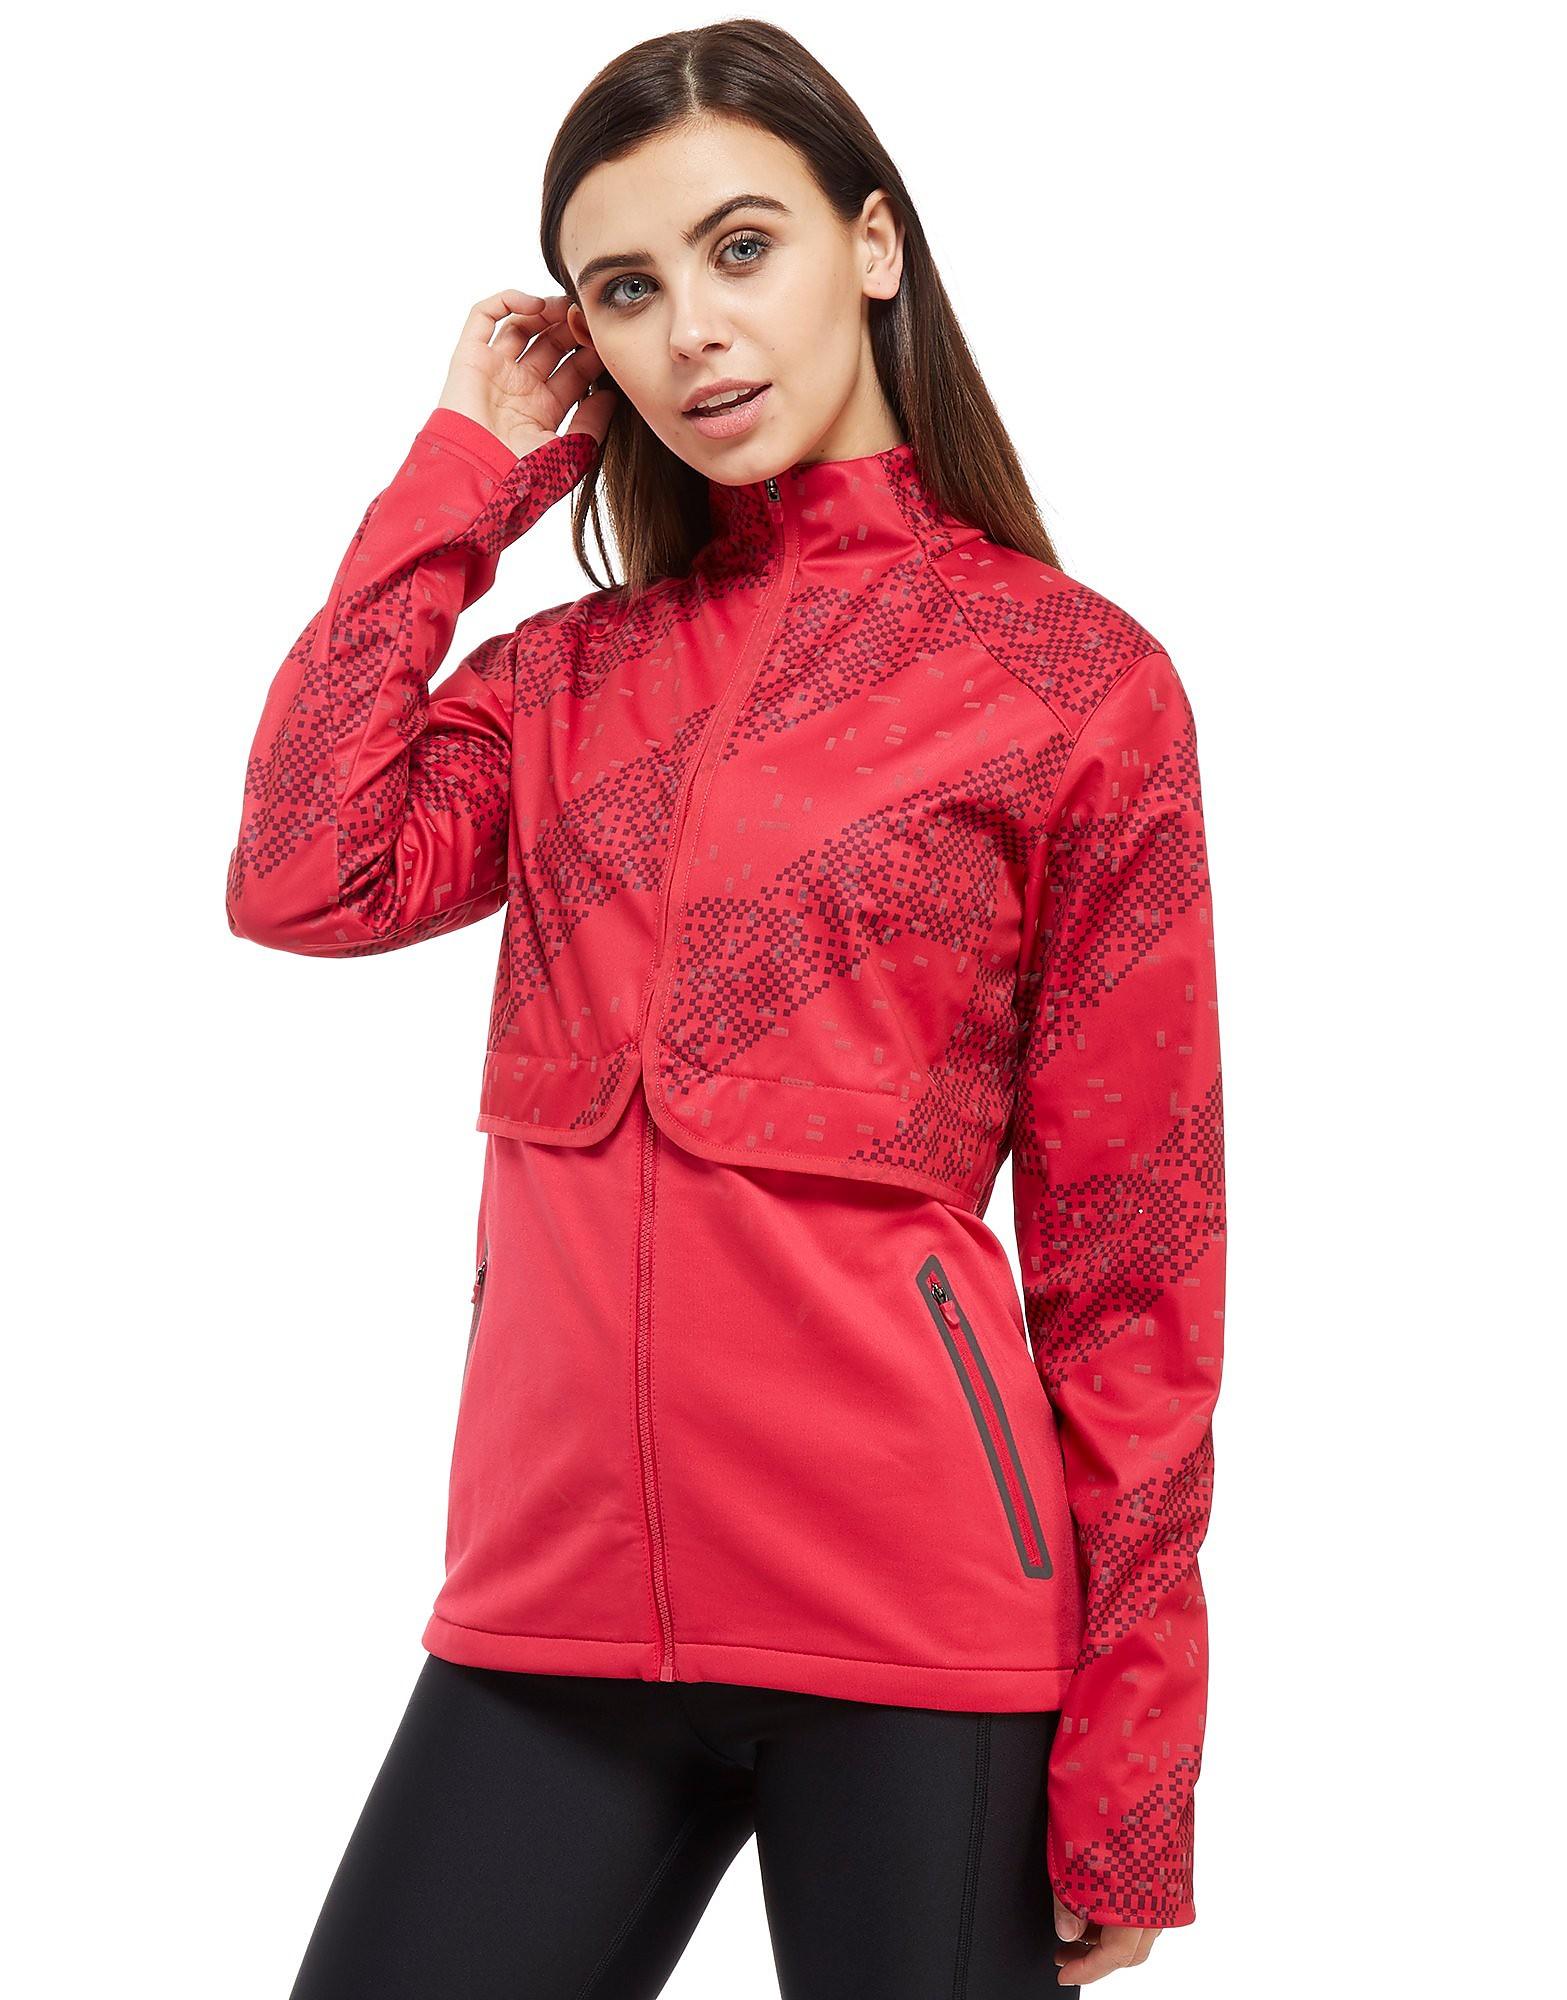 ASICS Lite-Show Winter Running Jacket